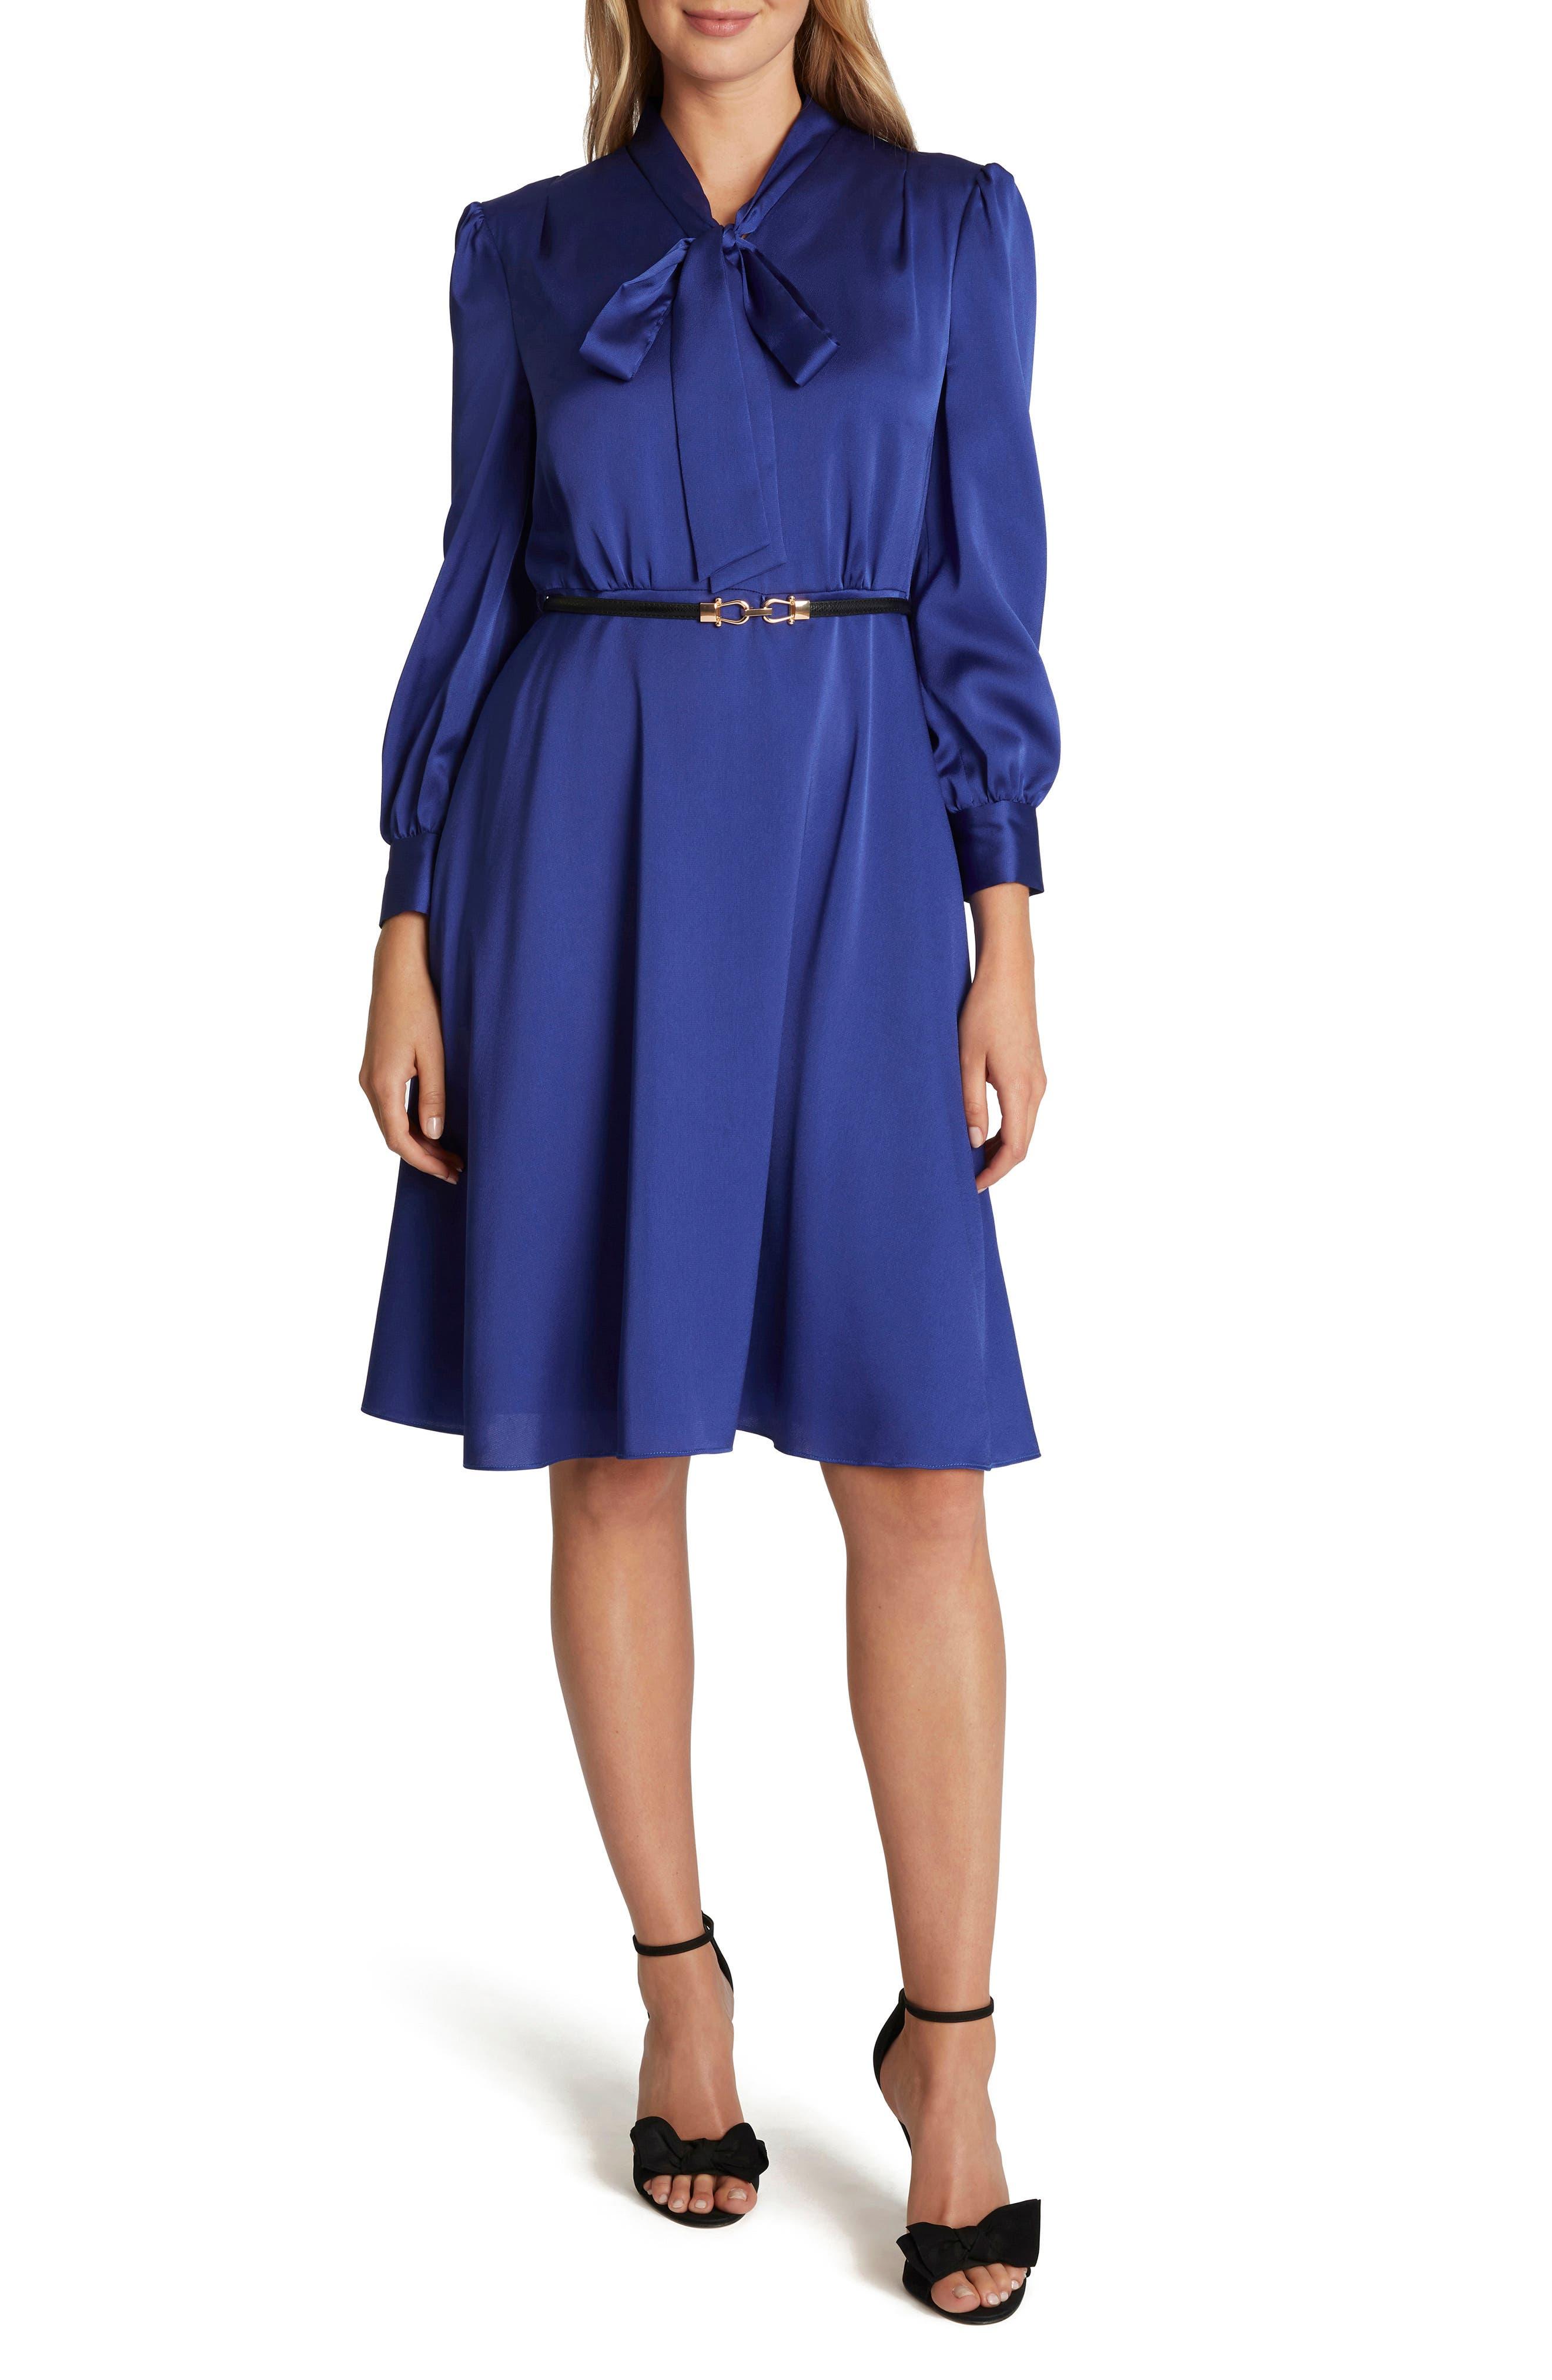 1940s Dresses | 40s Dress, Swing Dress, Tea Dresses Womens Tahari Tie Neck Long Sleeve Chiffon Dress $148.00 AT vintagedancer.com